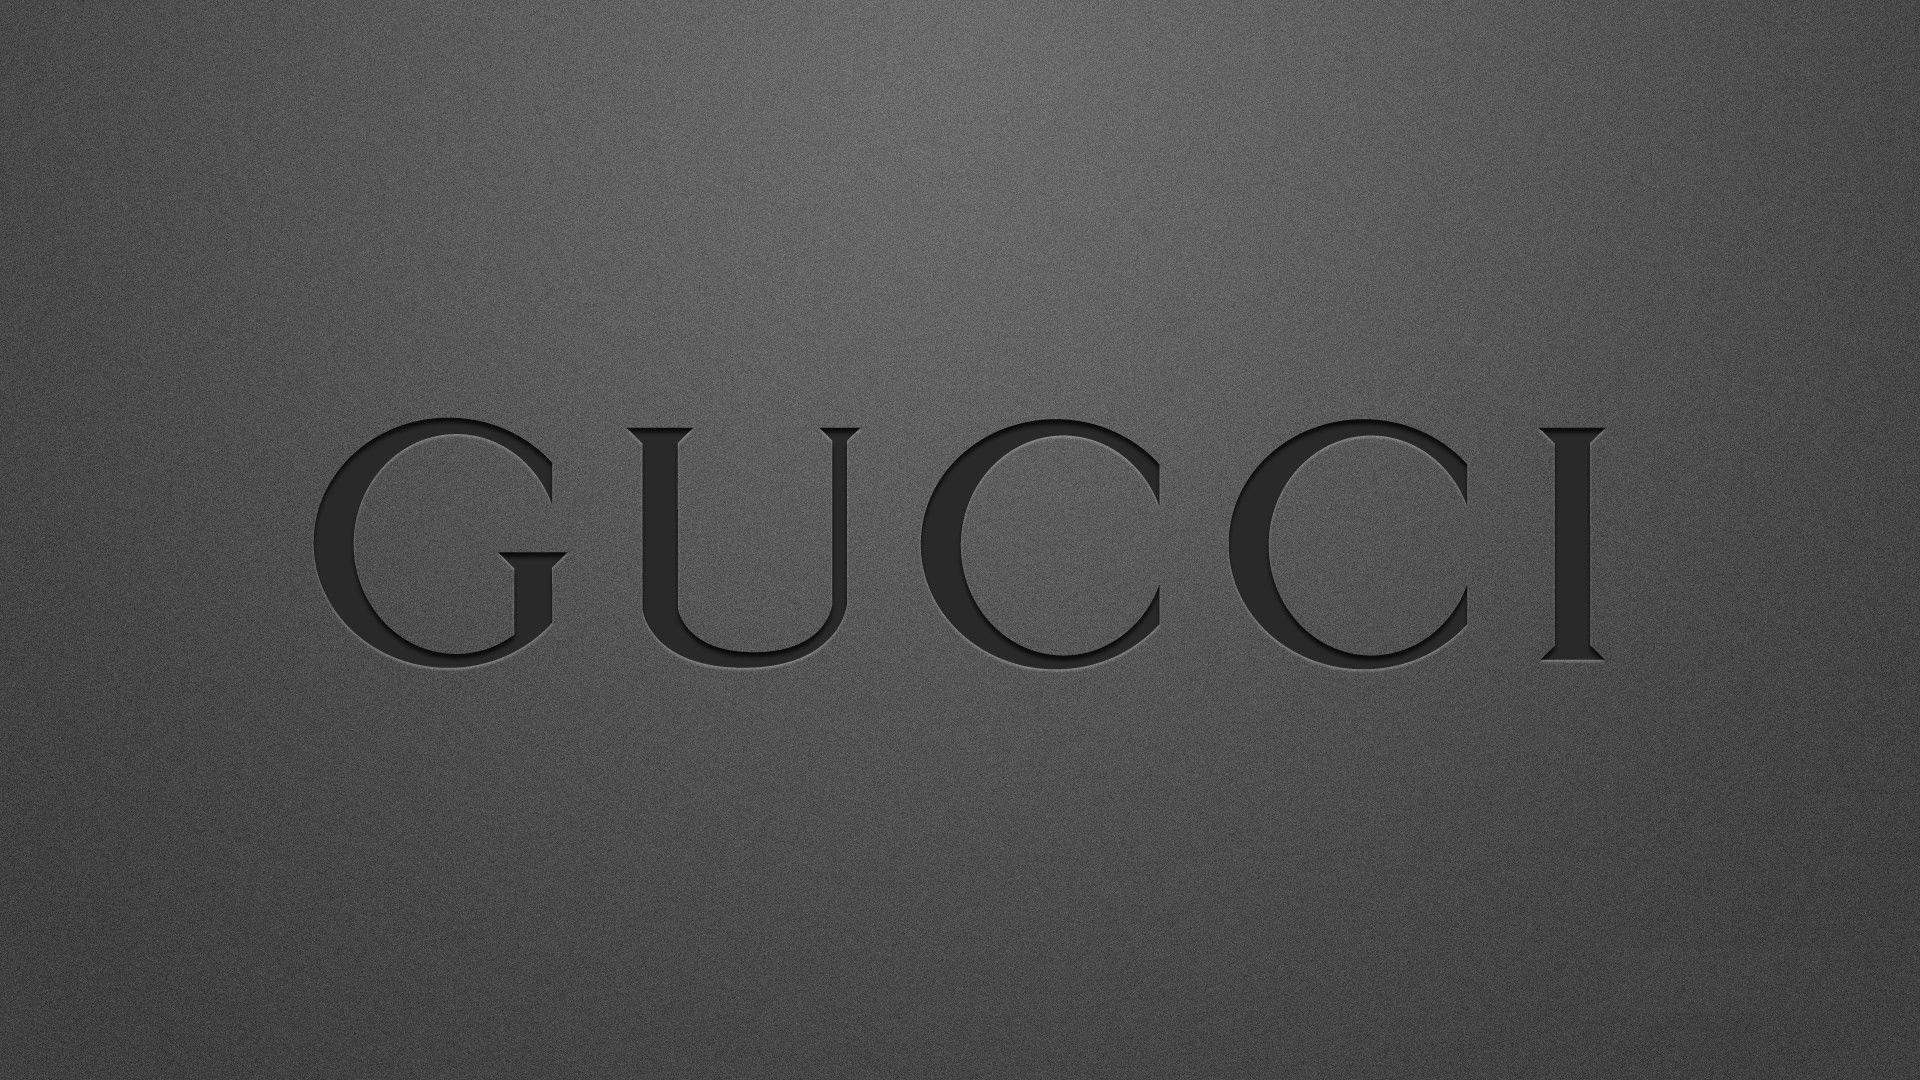 Gucci Wallpapers \u2022 TrumpWallpapers